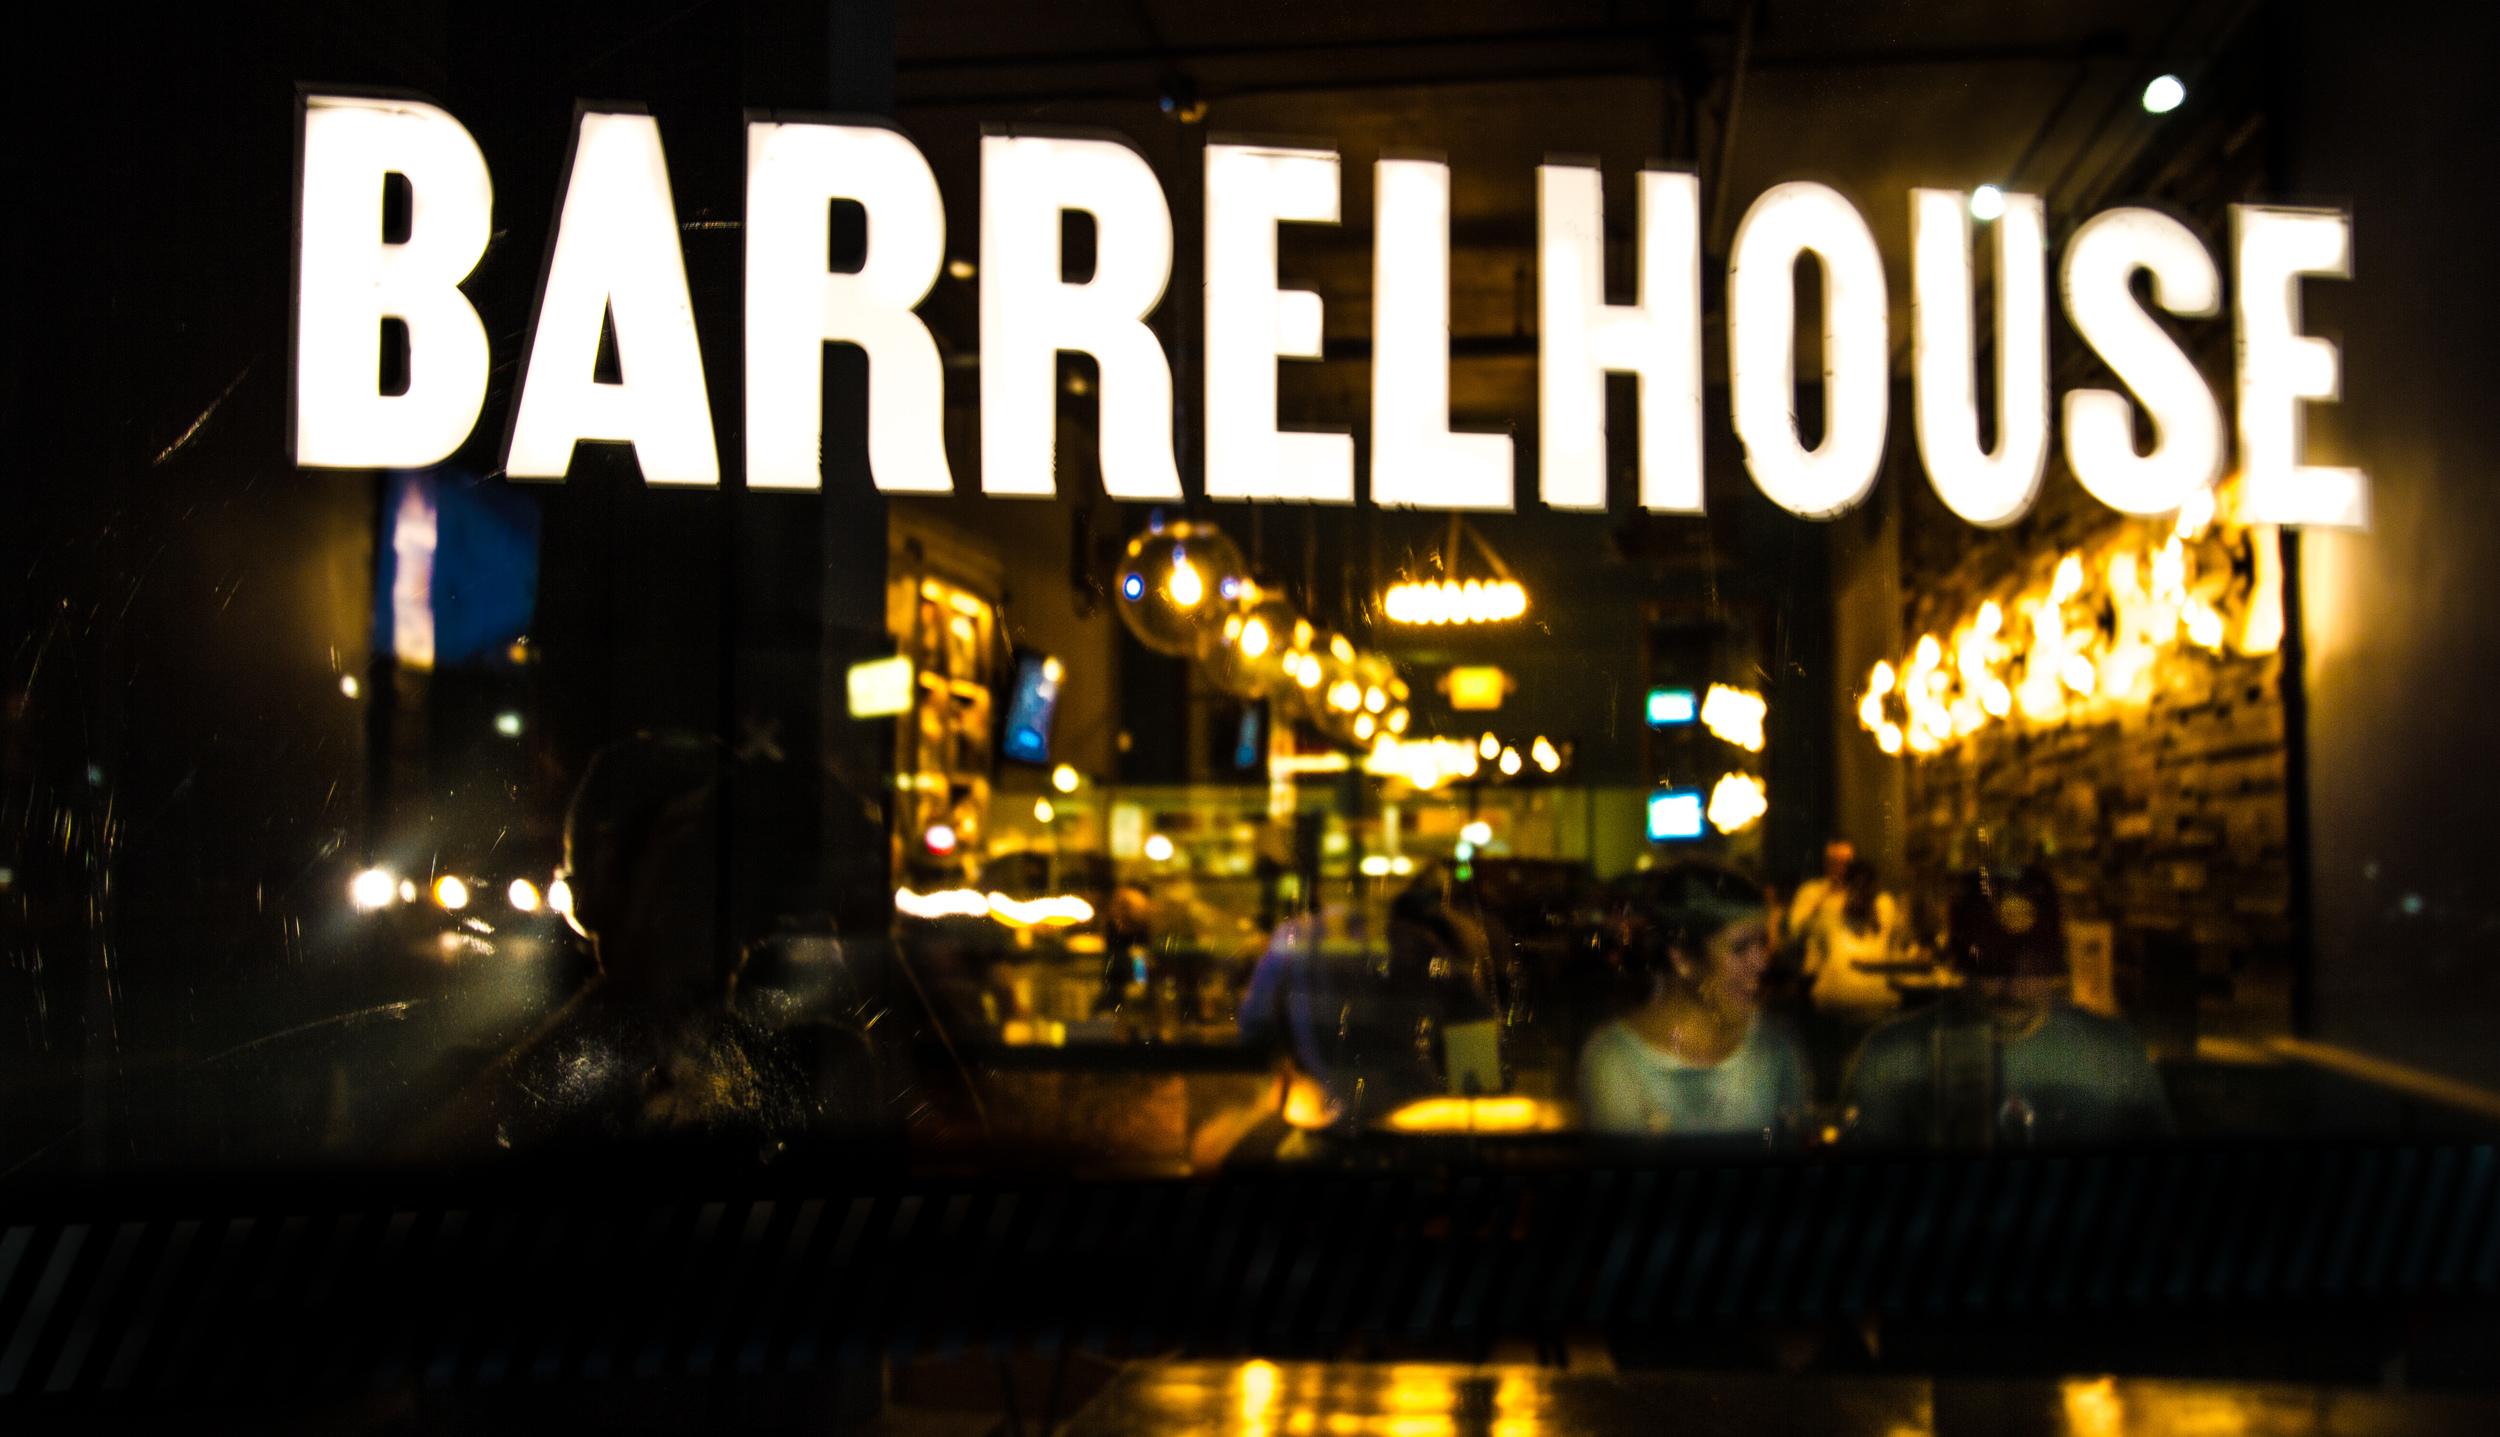 BarrelHouse_111314_JKeefe_7D-9925.jpg